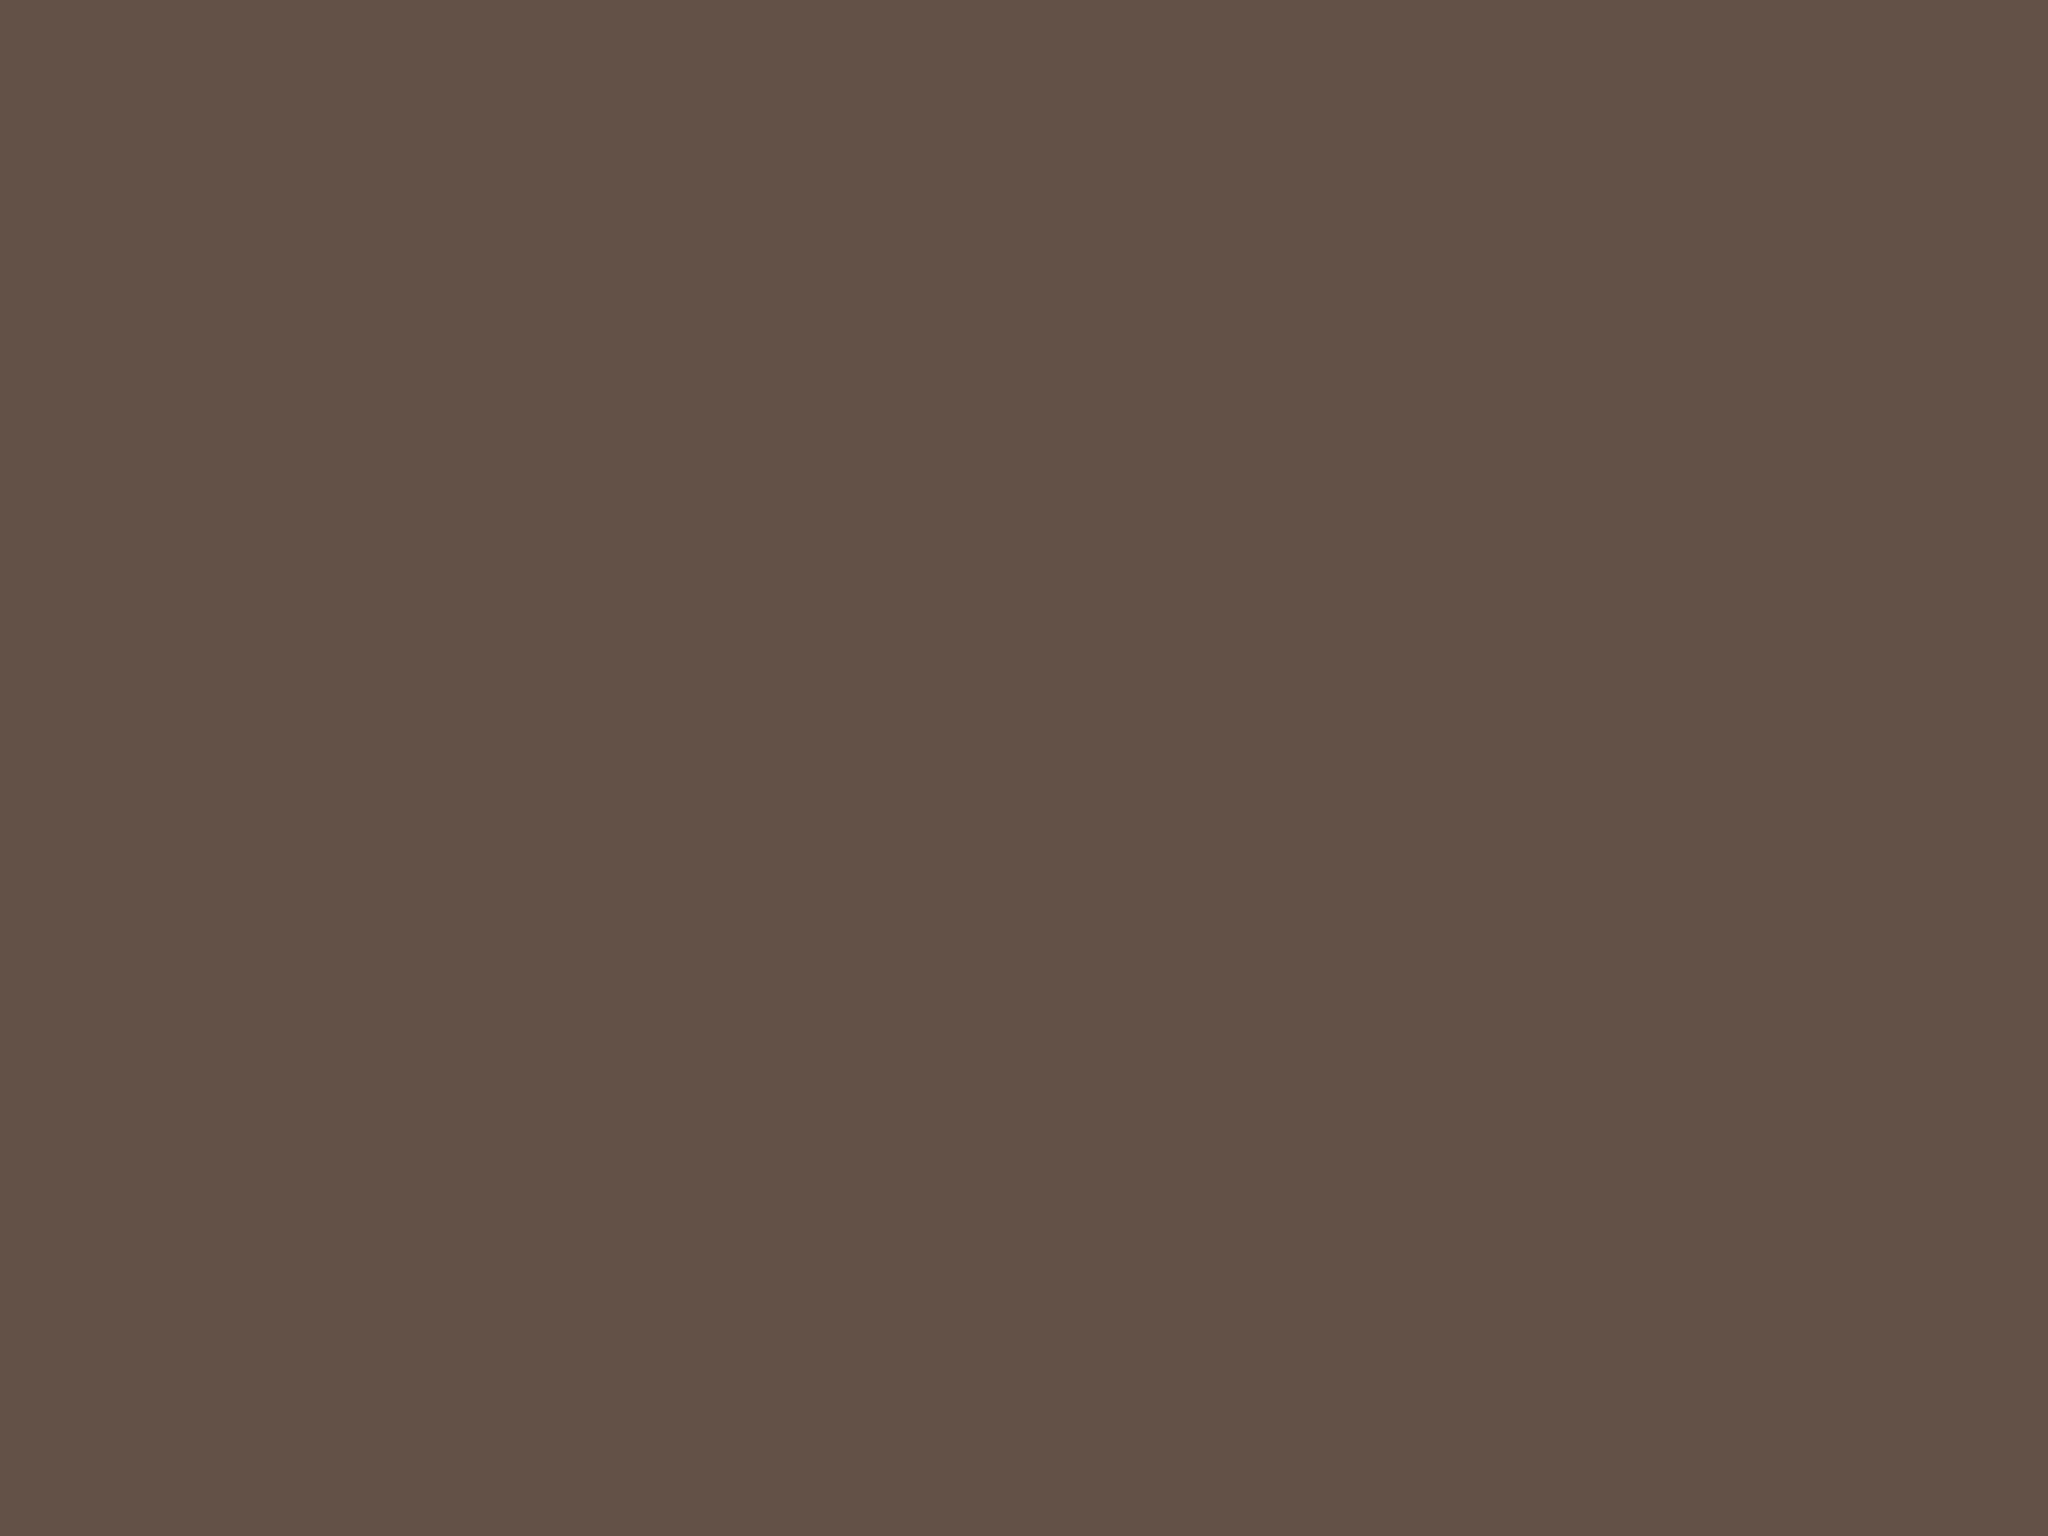 2048x1536 Umber Solid Color Background